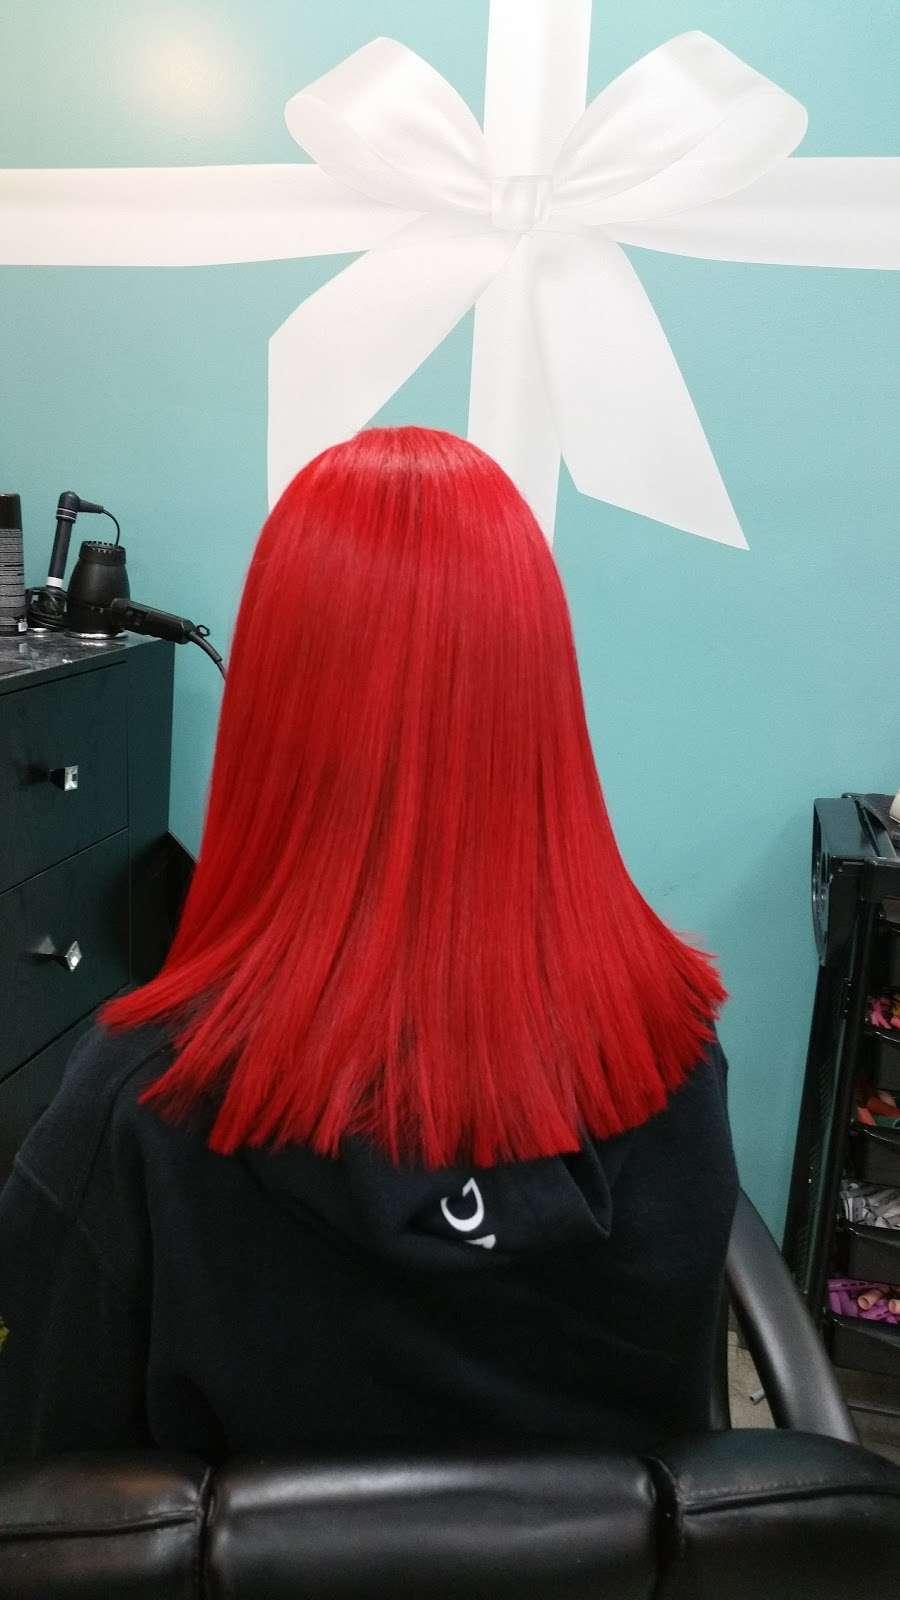 Finally My Salon Hair Studio - hair care    Photo 8 of 10   Address: 74-19 Myrtle Ave, Flushing, NY 11385, USA   Phone: (718) 456-4247